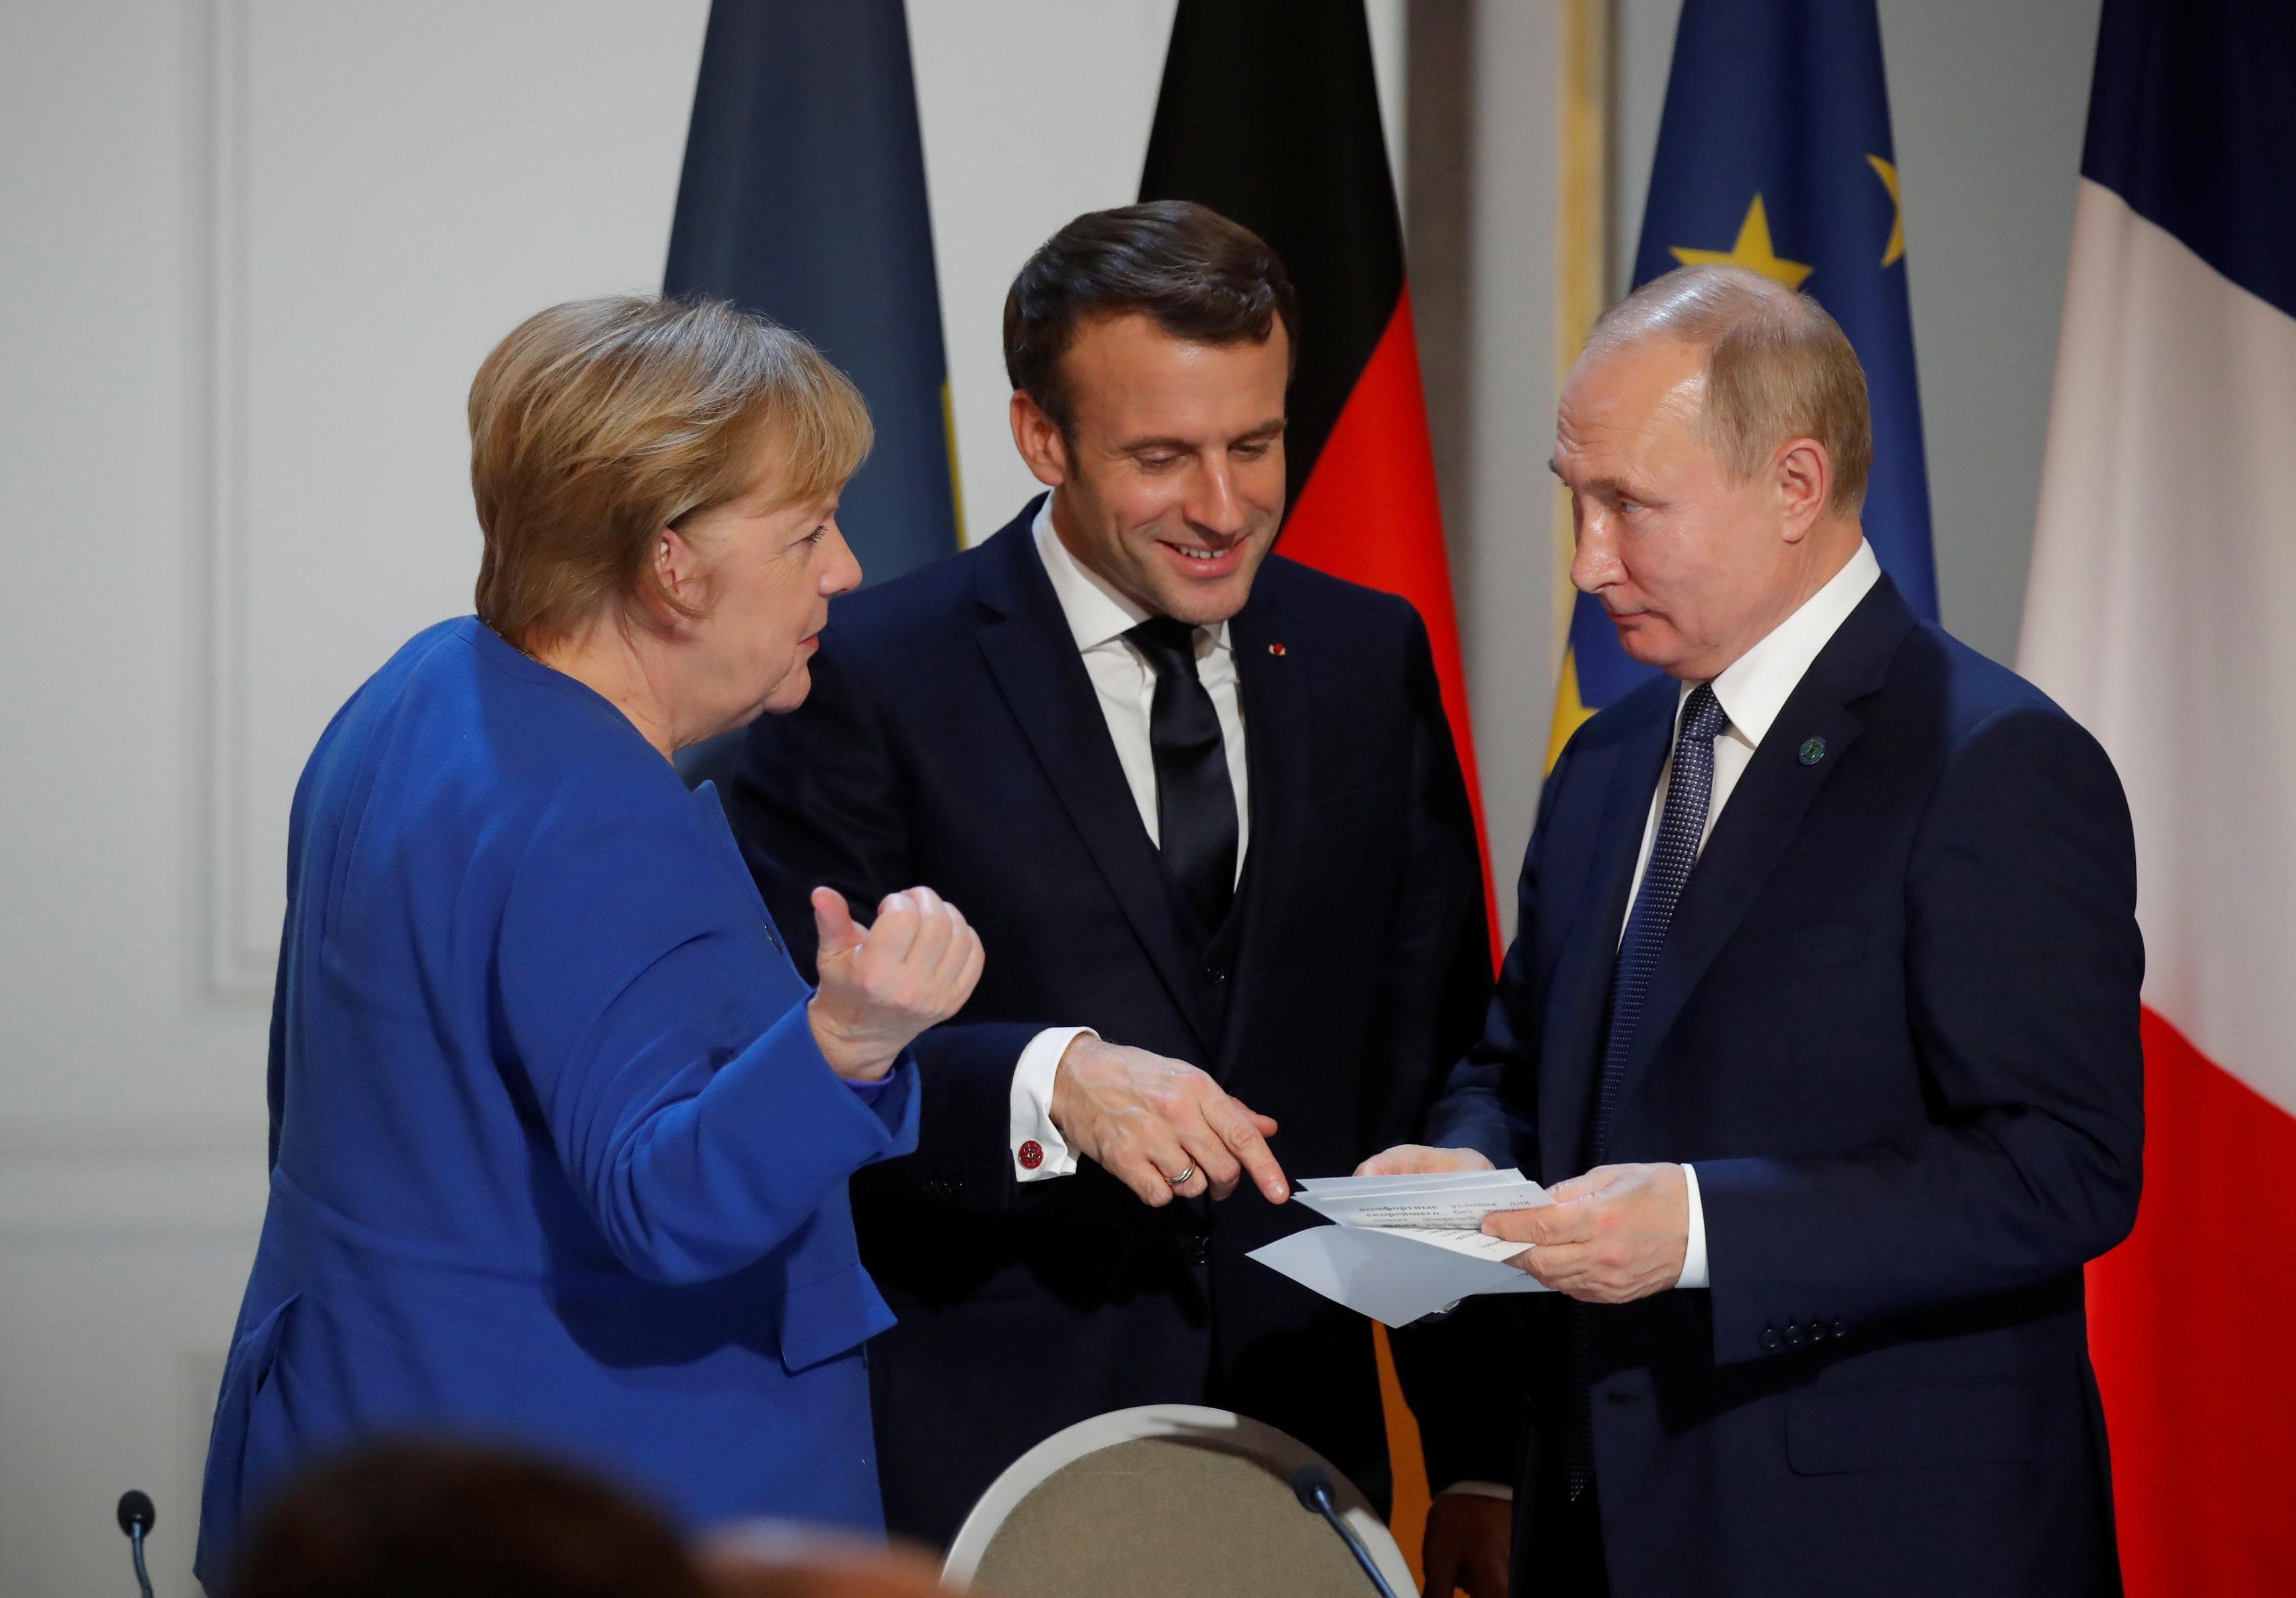 European leaders and Russian President Vladimir Putin